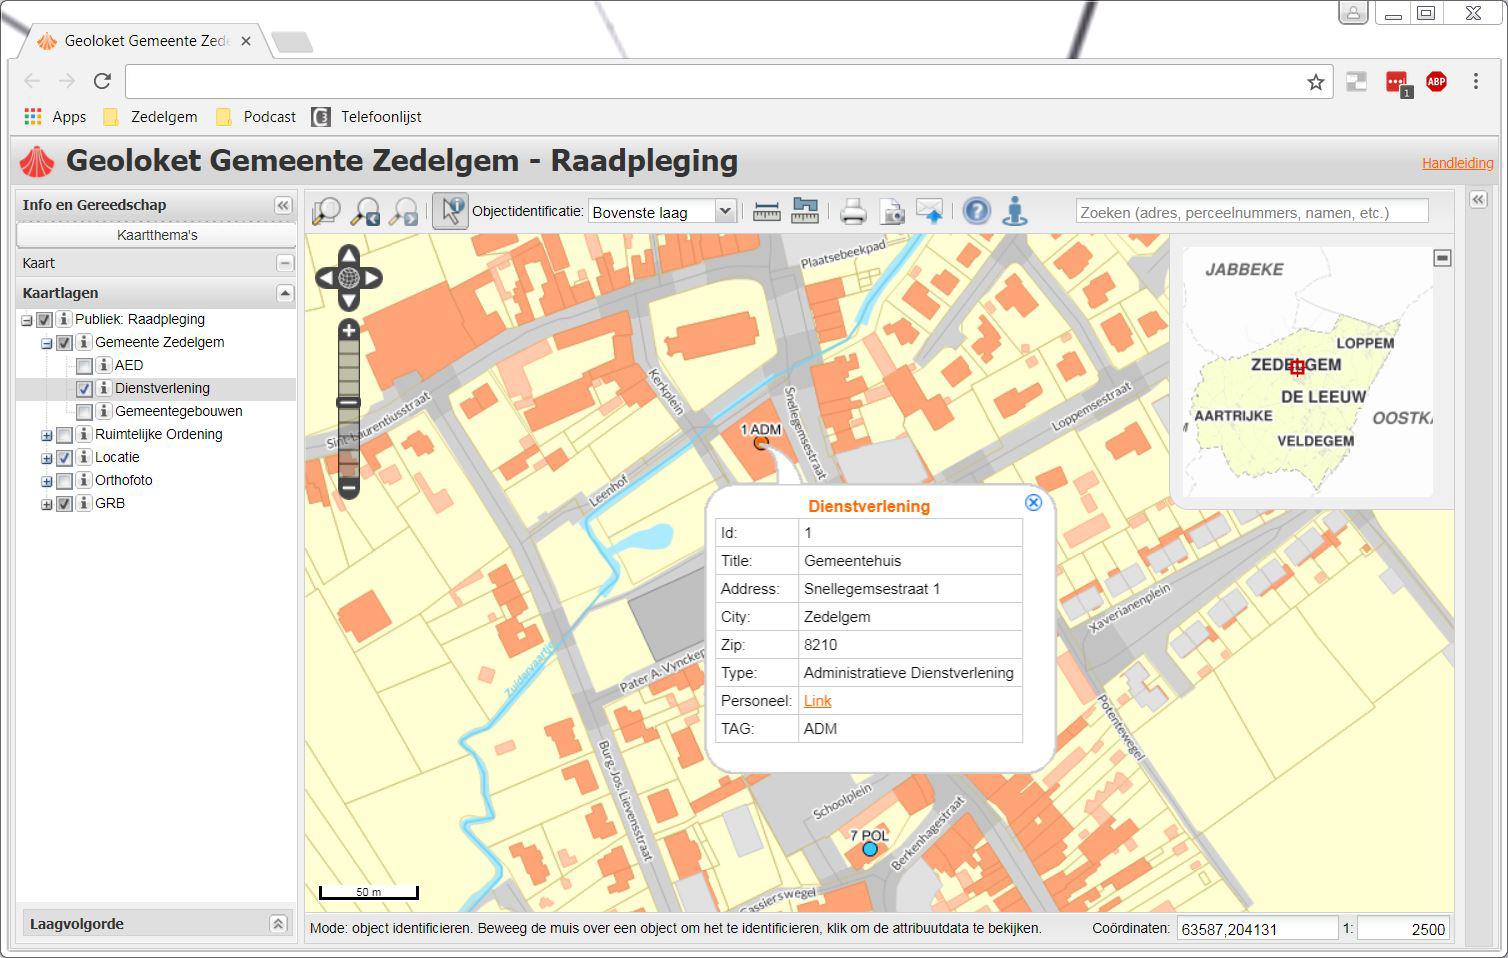 Screenshot_Geoloket_Gemeente_Zedelgem